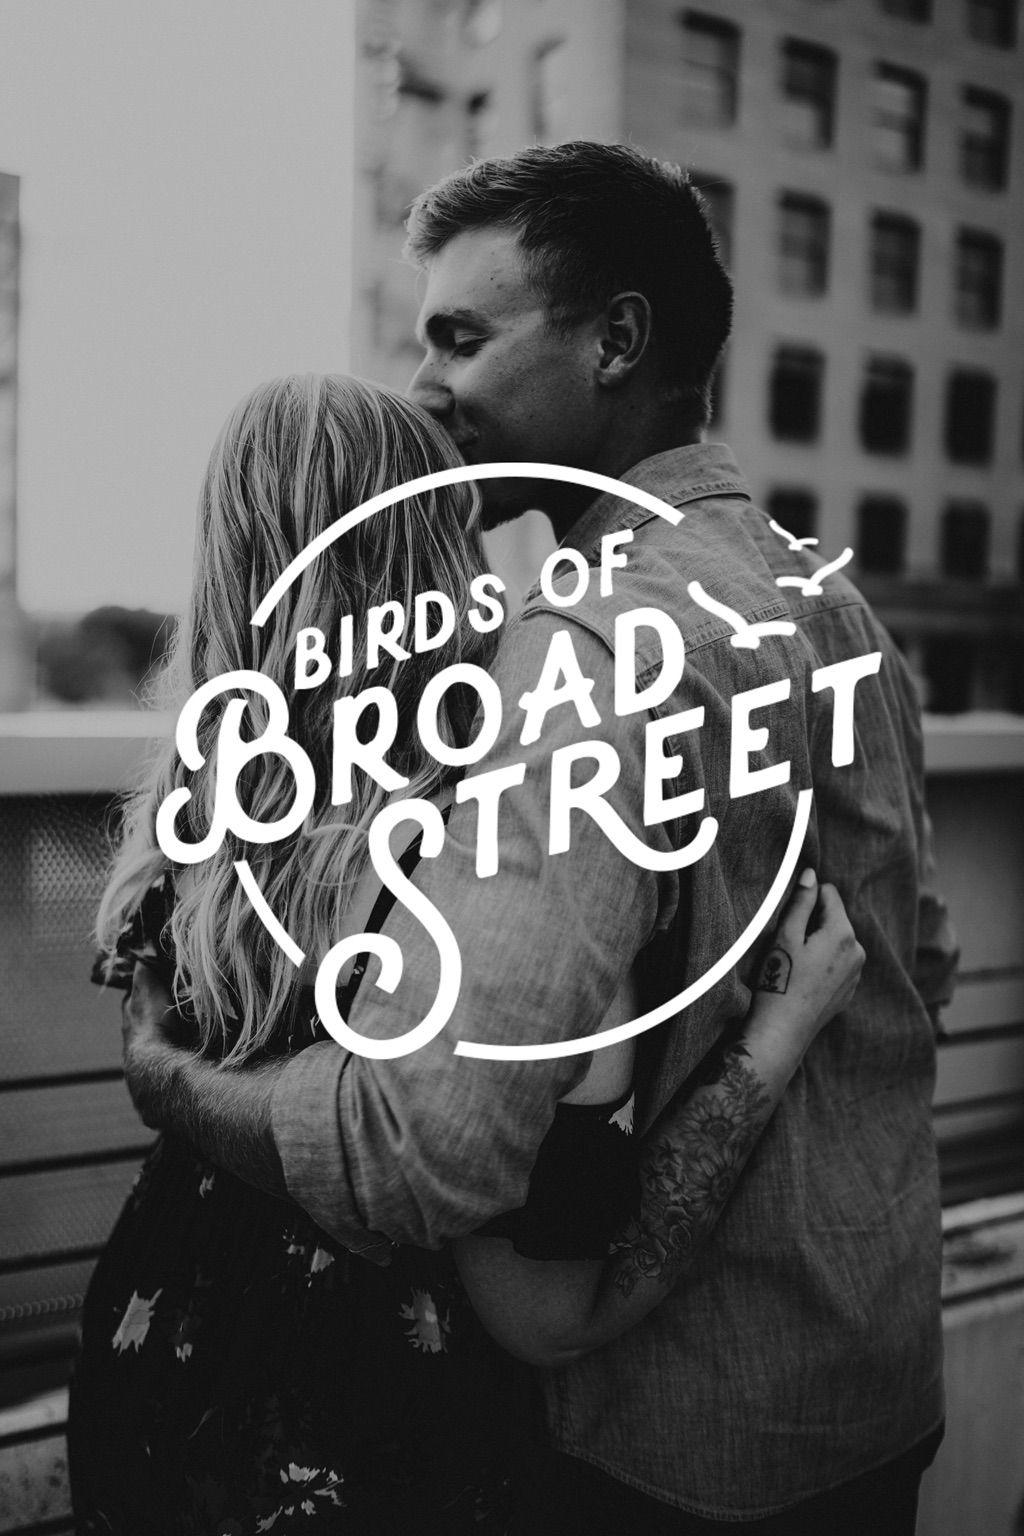 Birds of Broad Street